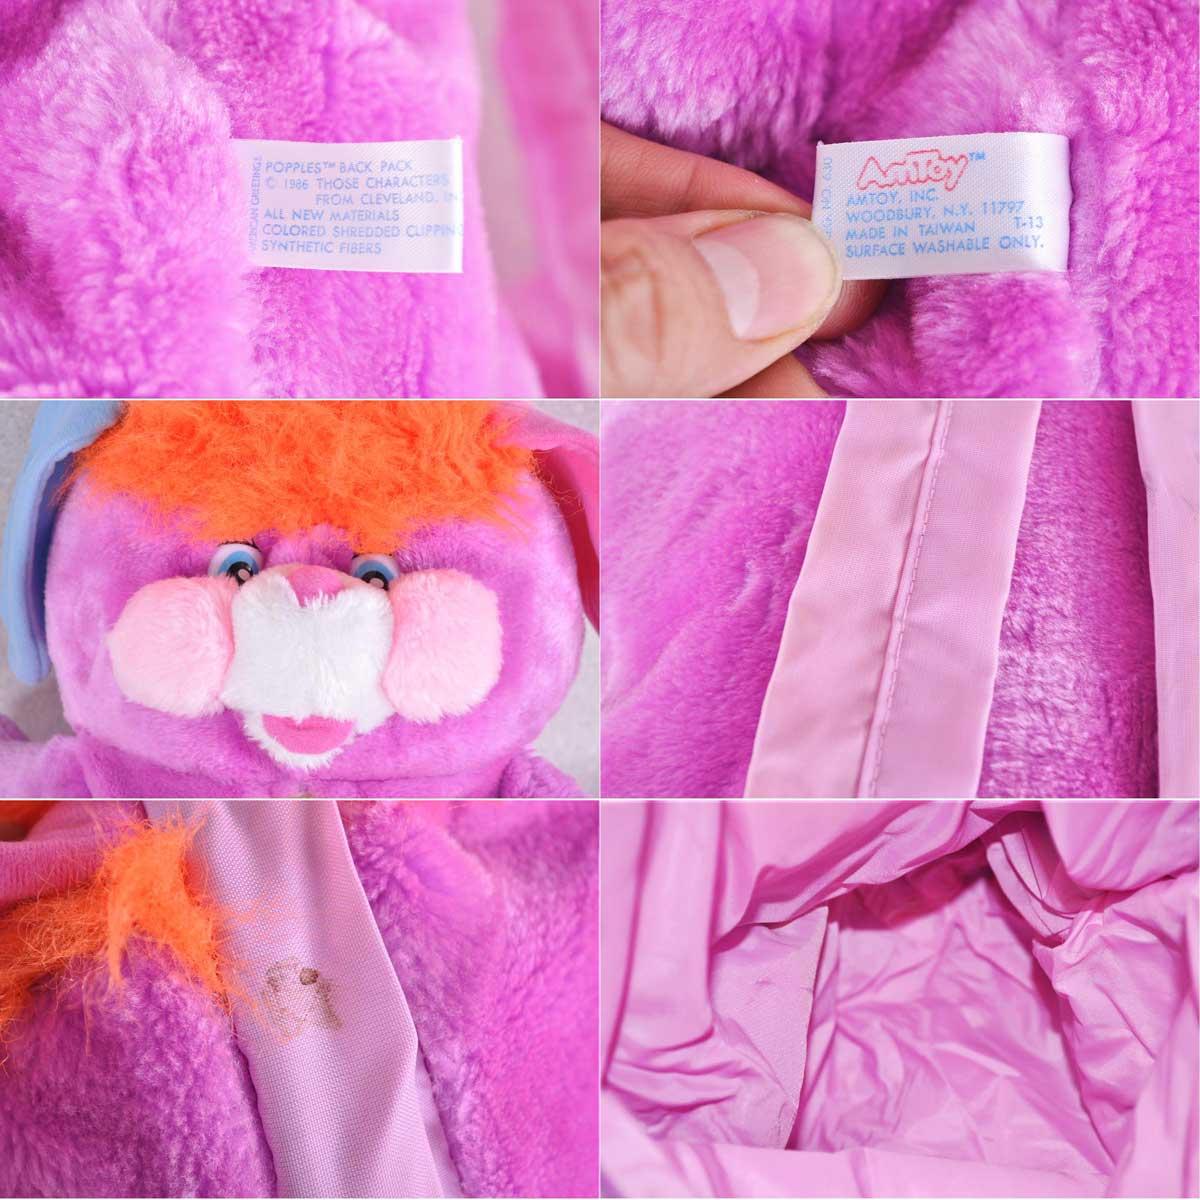 Vintage 1986 / AmToy Amati / POPPLES popples / backpack stuffed backpack / pink 1